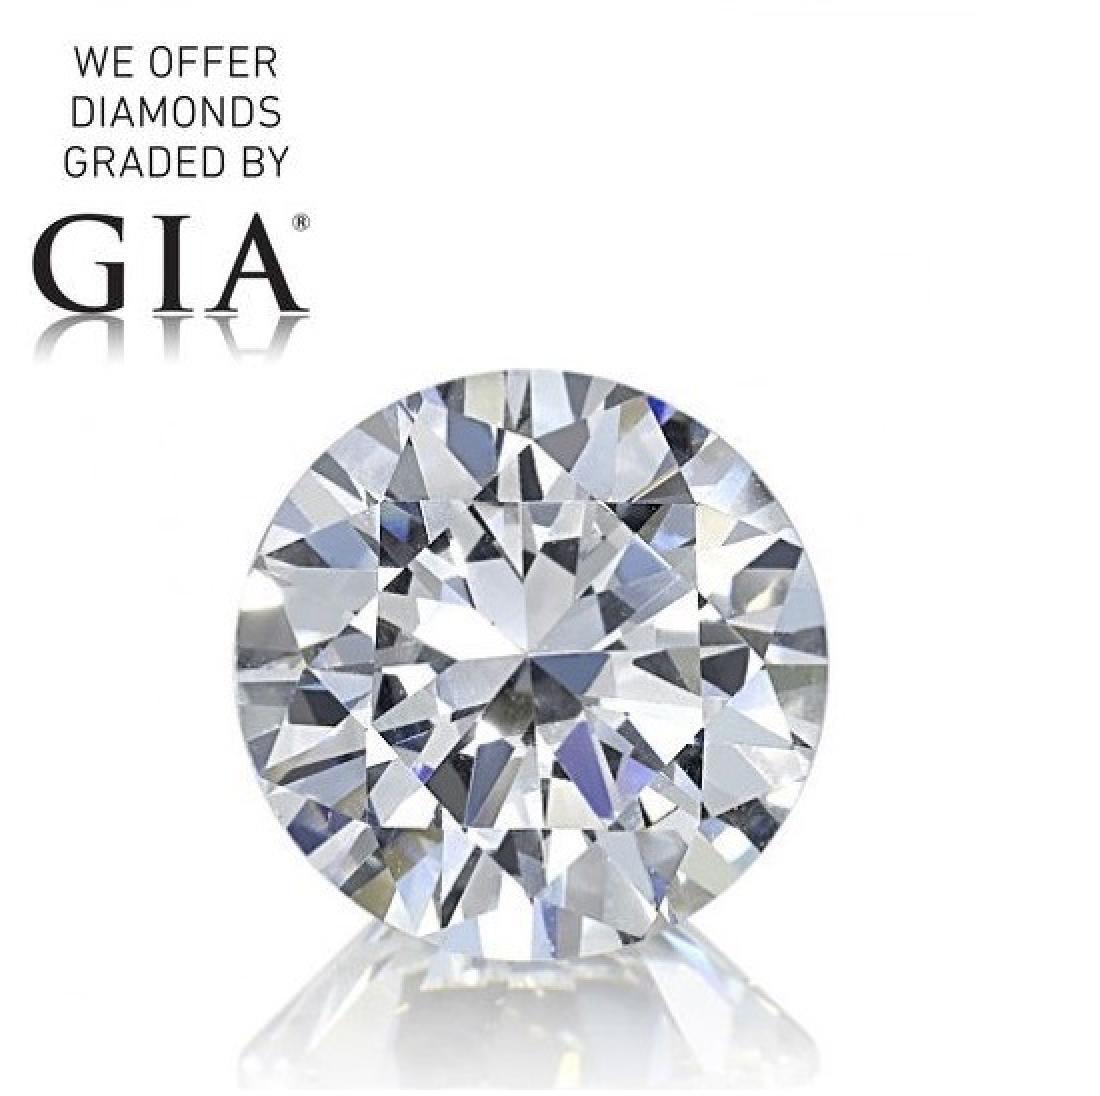 1.00 ct, Color D/VS1, Round cut Diamond